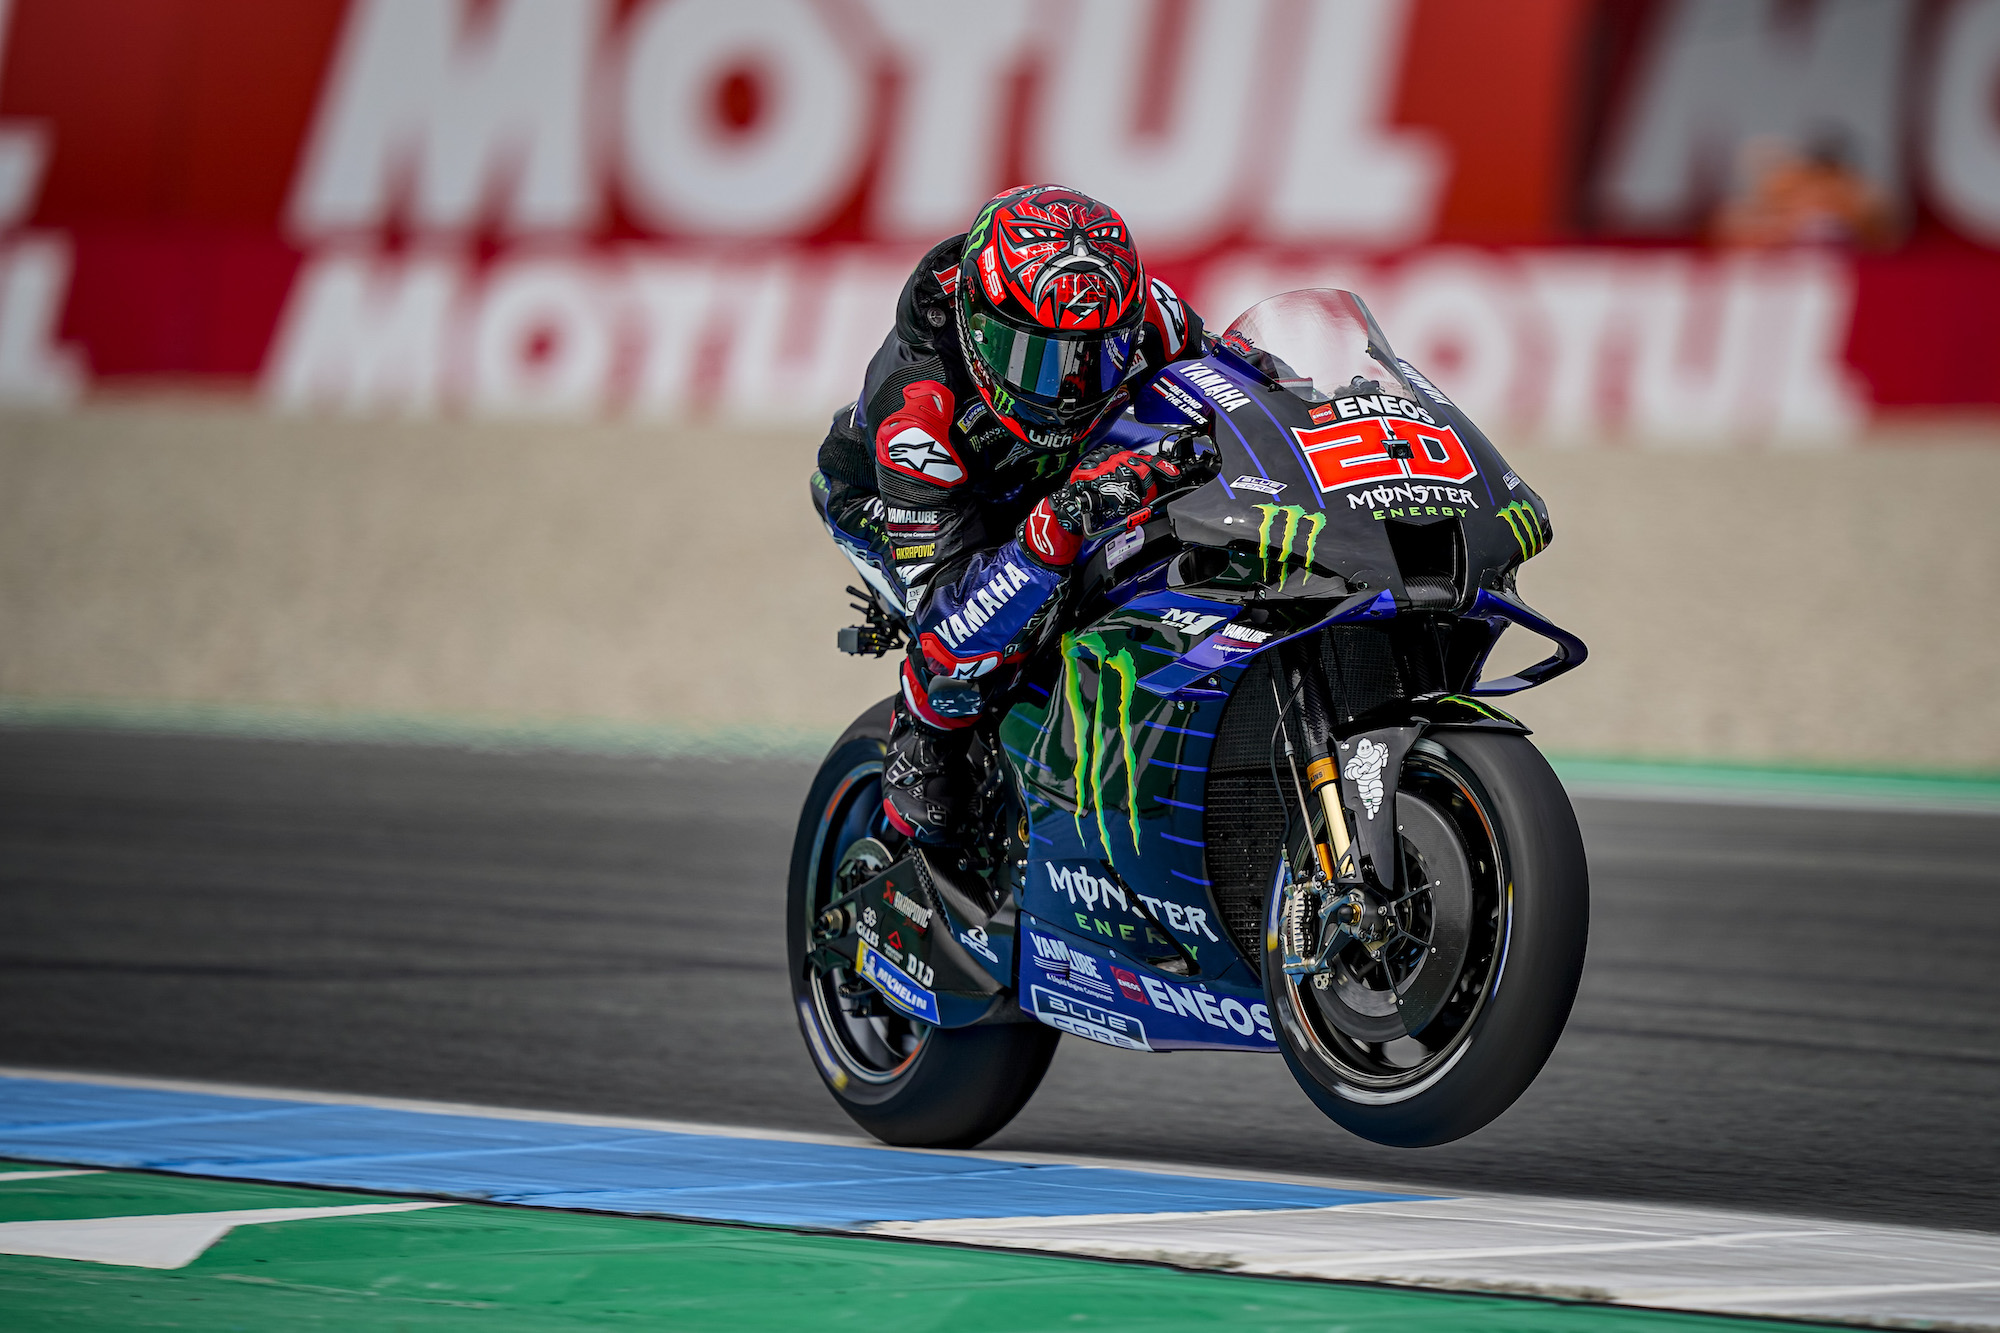 Fabio Quartararo w akcji podczas rundy MotoGP w Assen